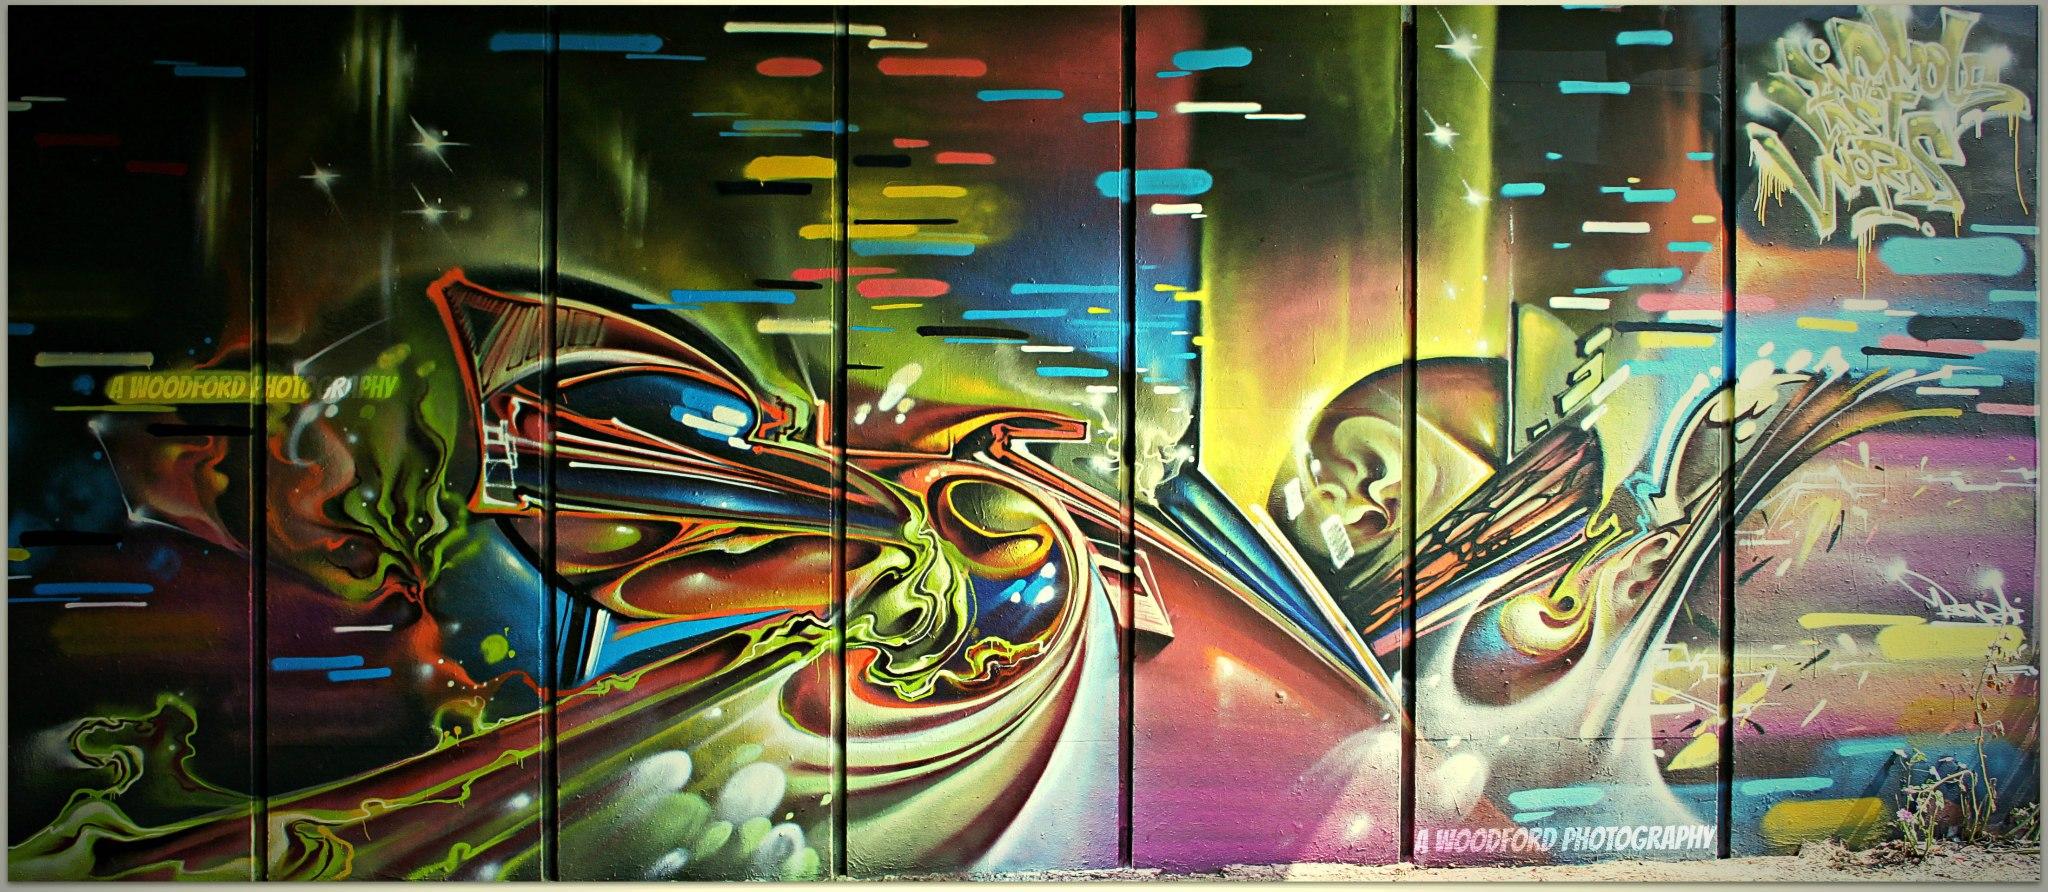 100 uk graffiti artists 1 artist dilk